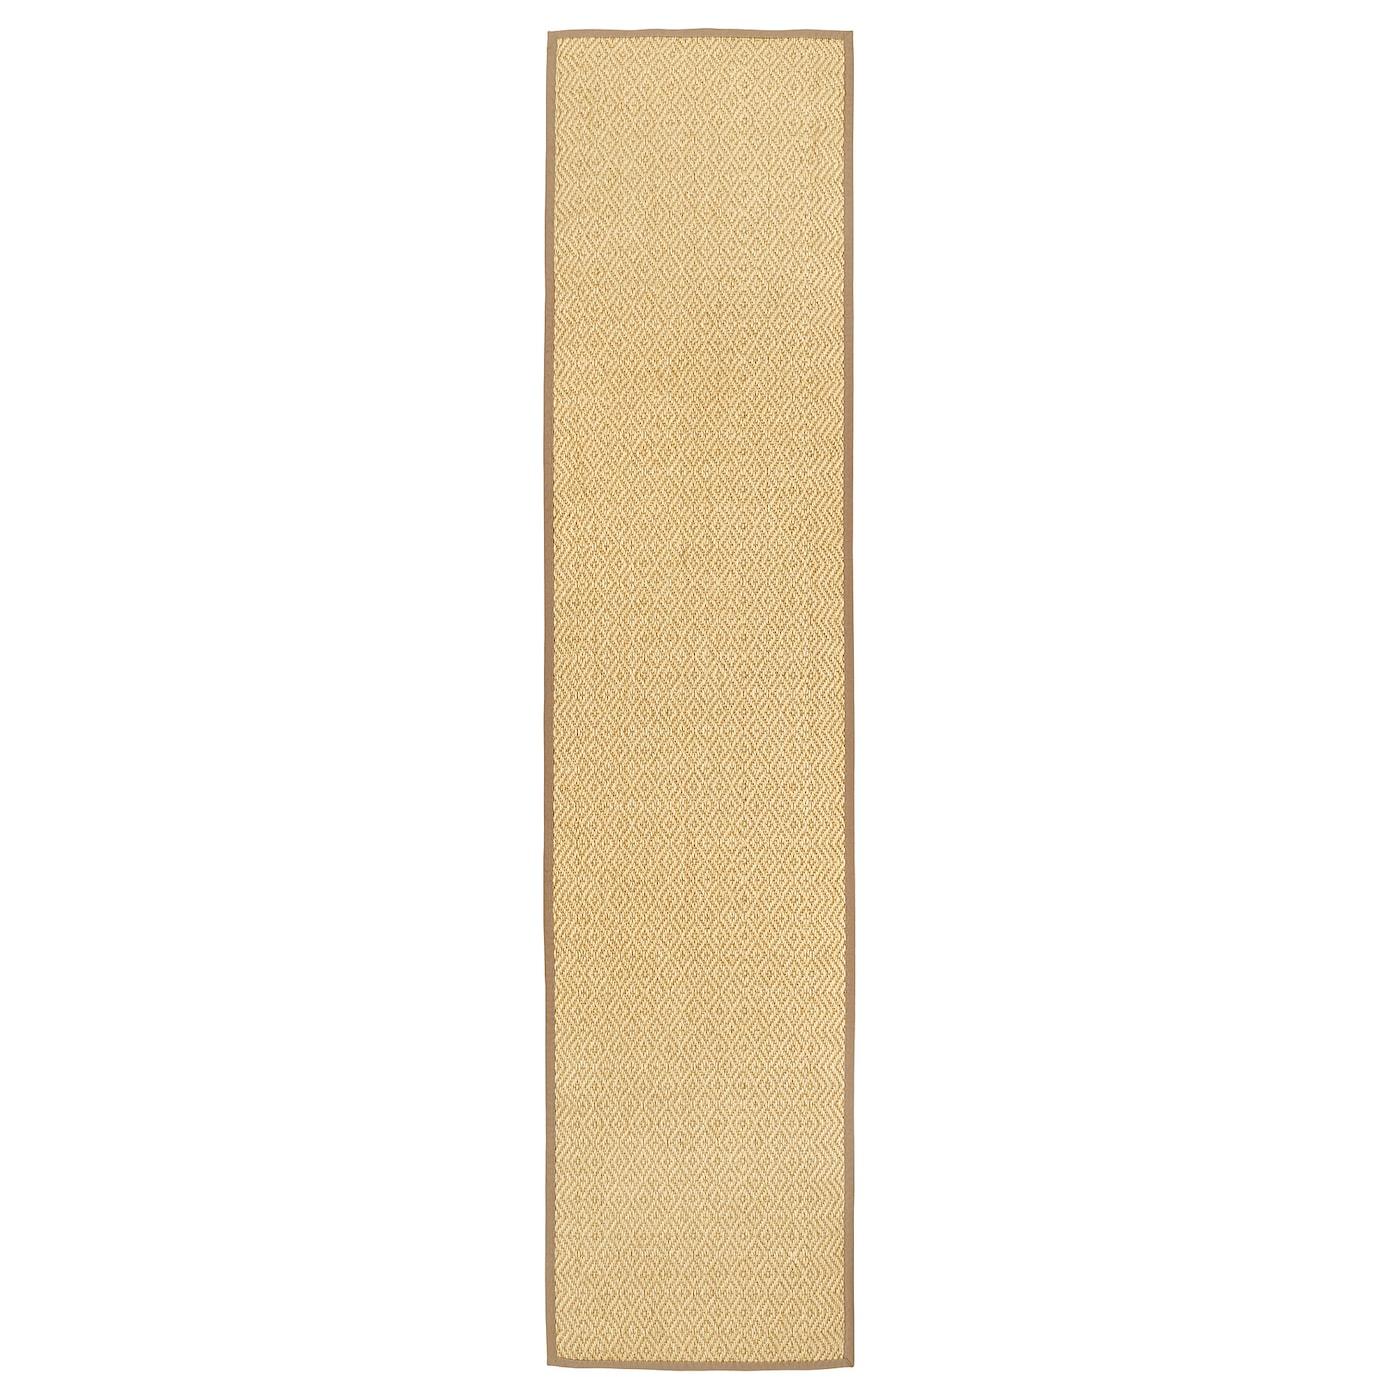 Alfombras Pequenas Textil Para El Hogar Compra Online Ikea